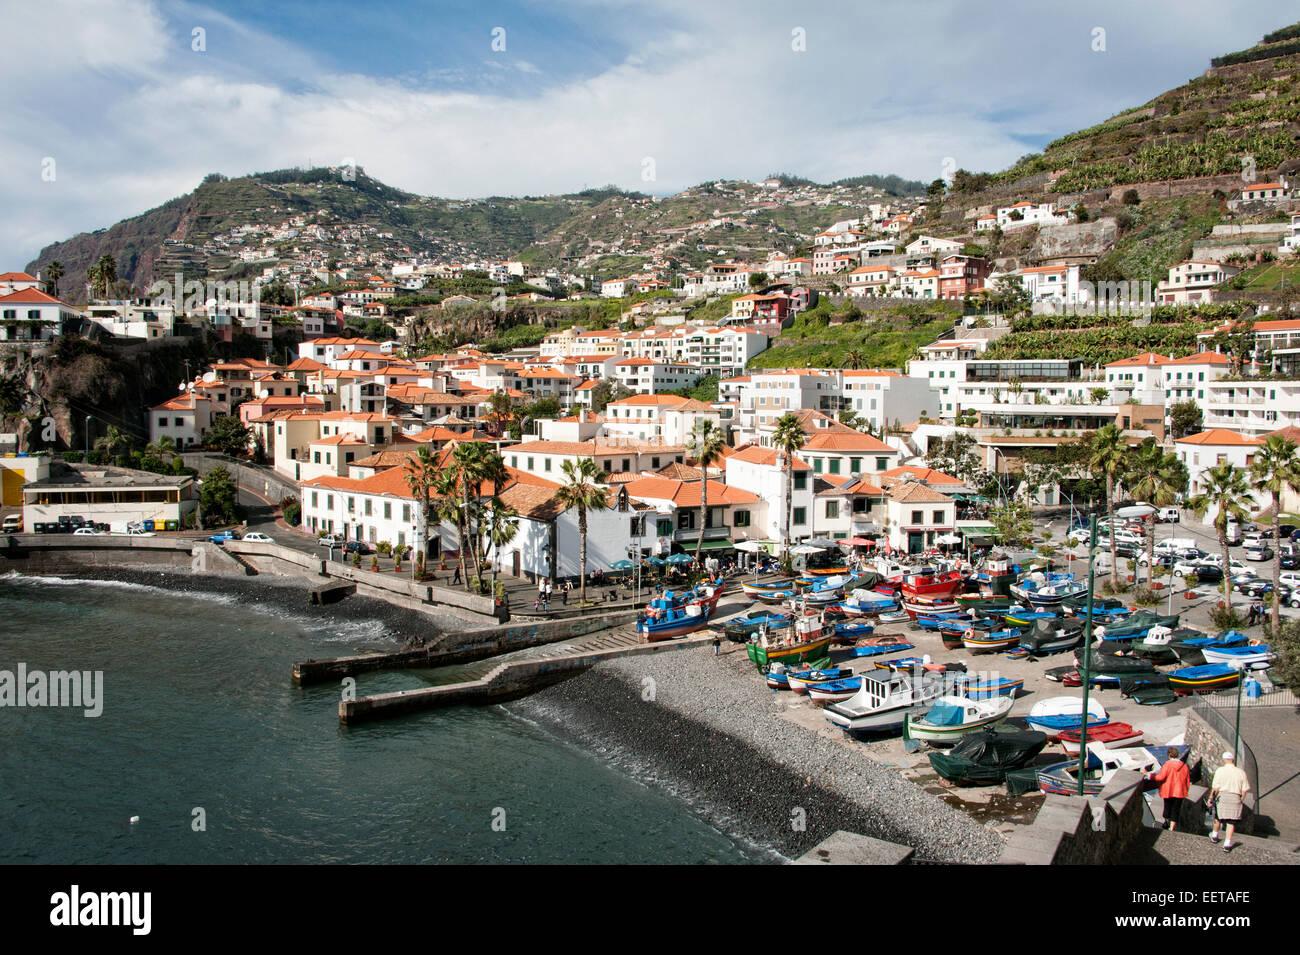 Reisen, Europa, le Portugal, Madère, Hafen mit bunten Fischerbooten à Camara de Lobos. Photo Stock